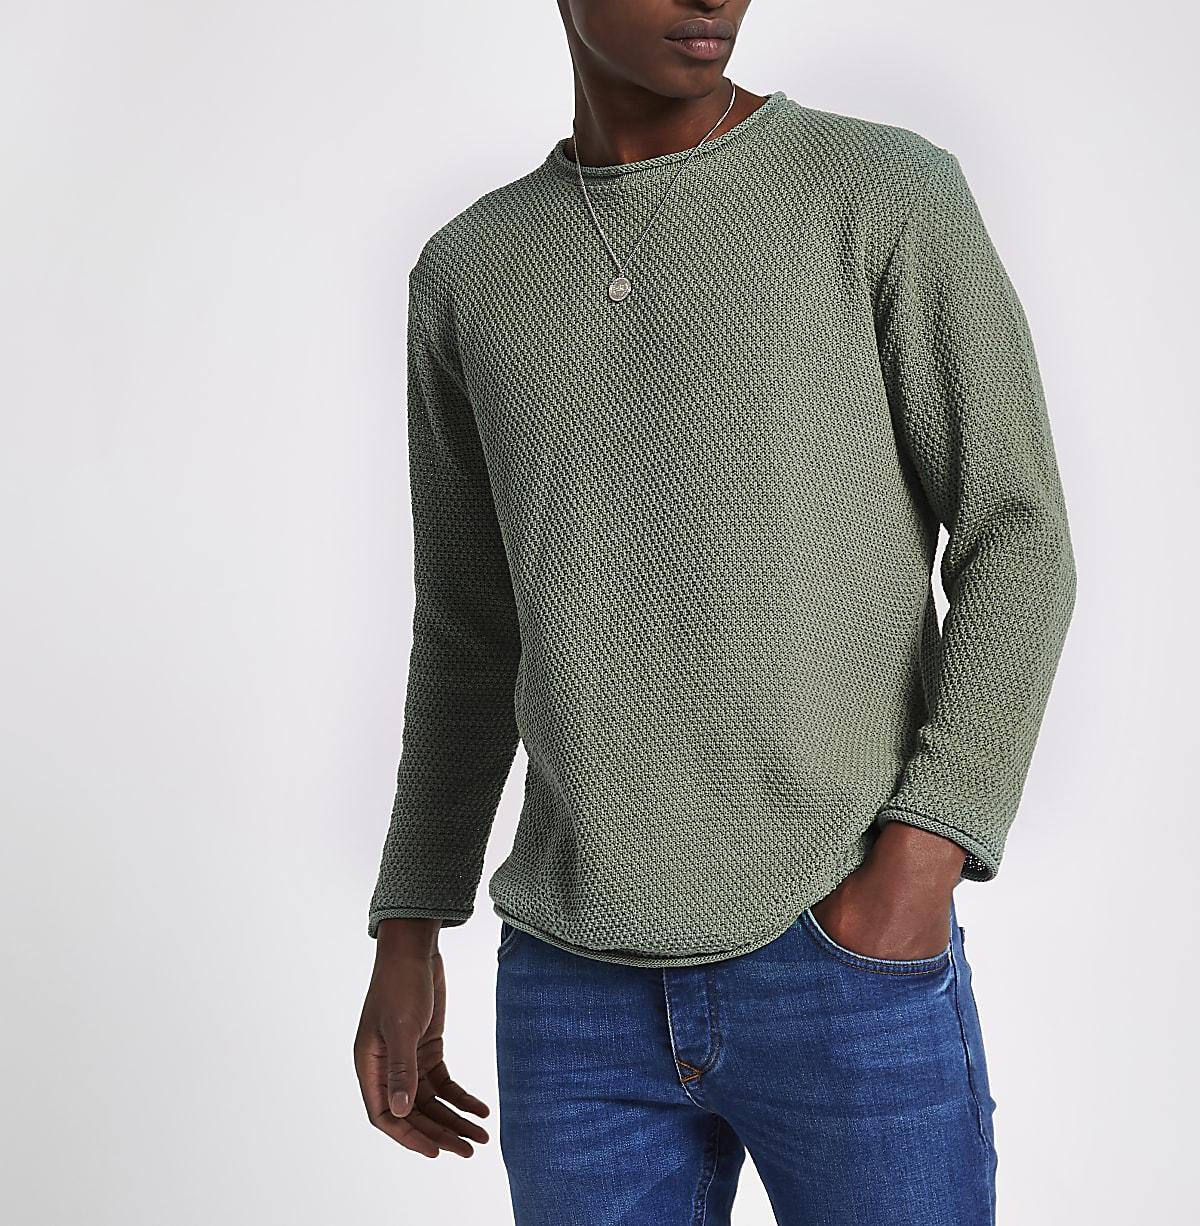 Green knit long sleeve slim fit sweater